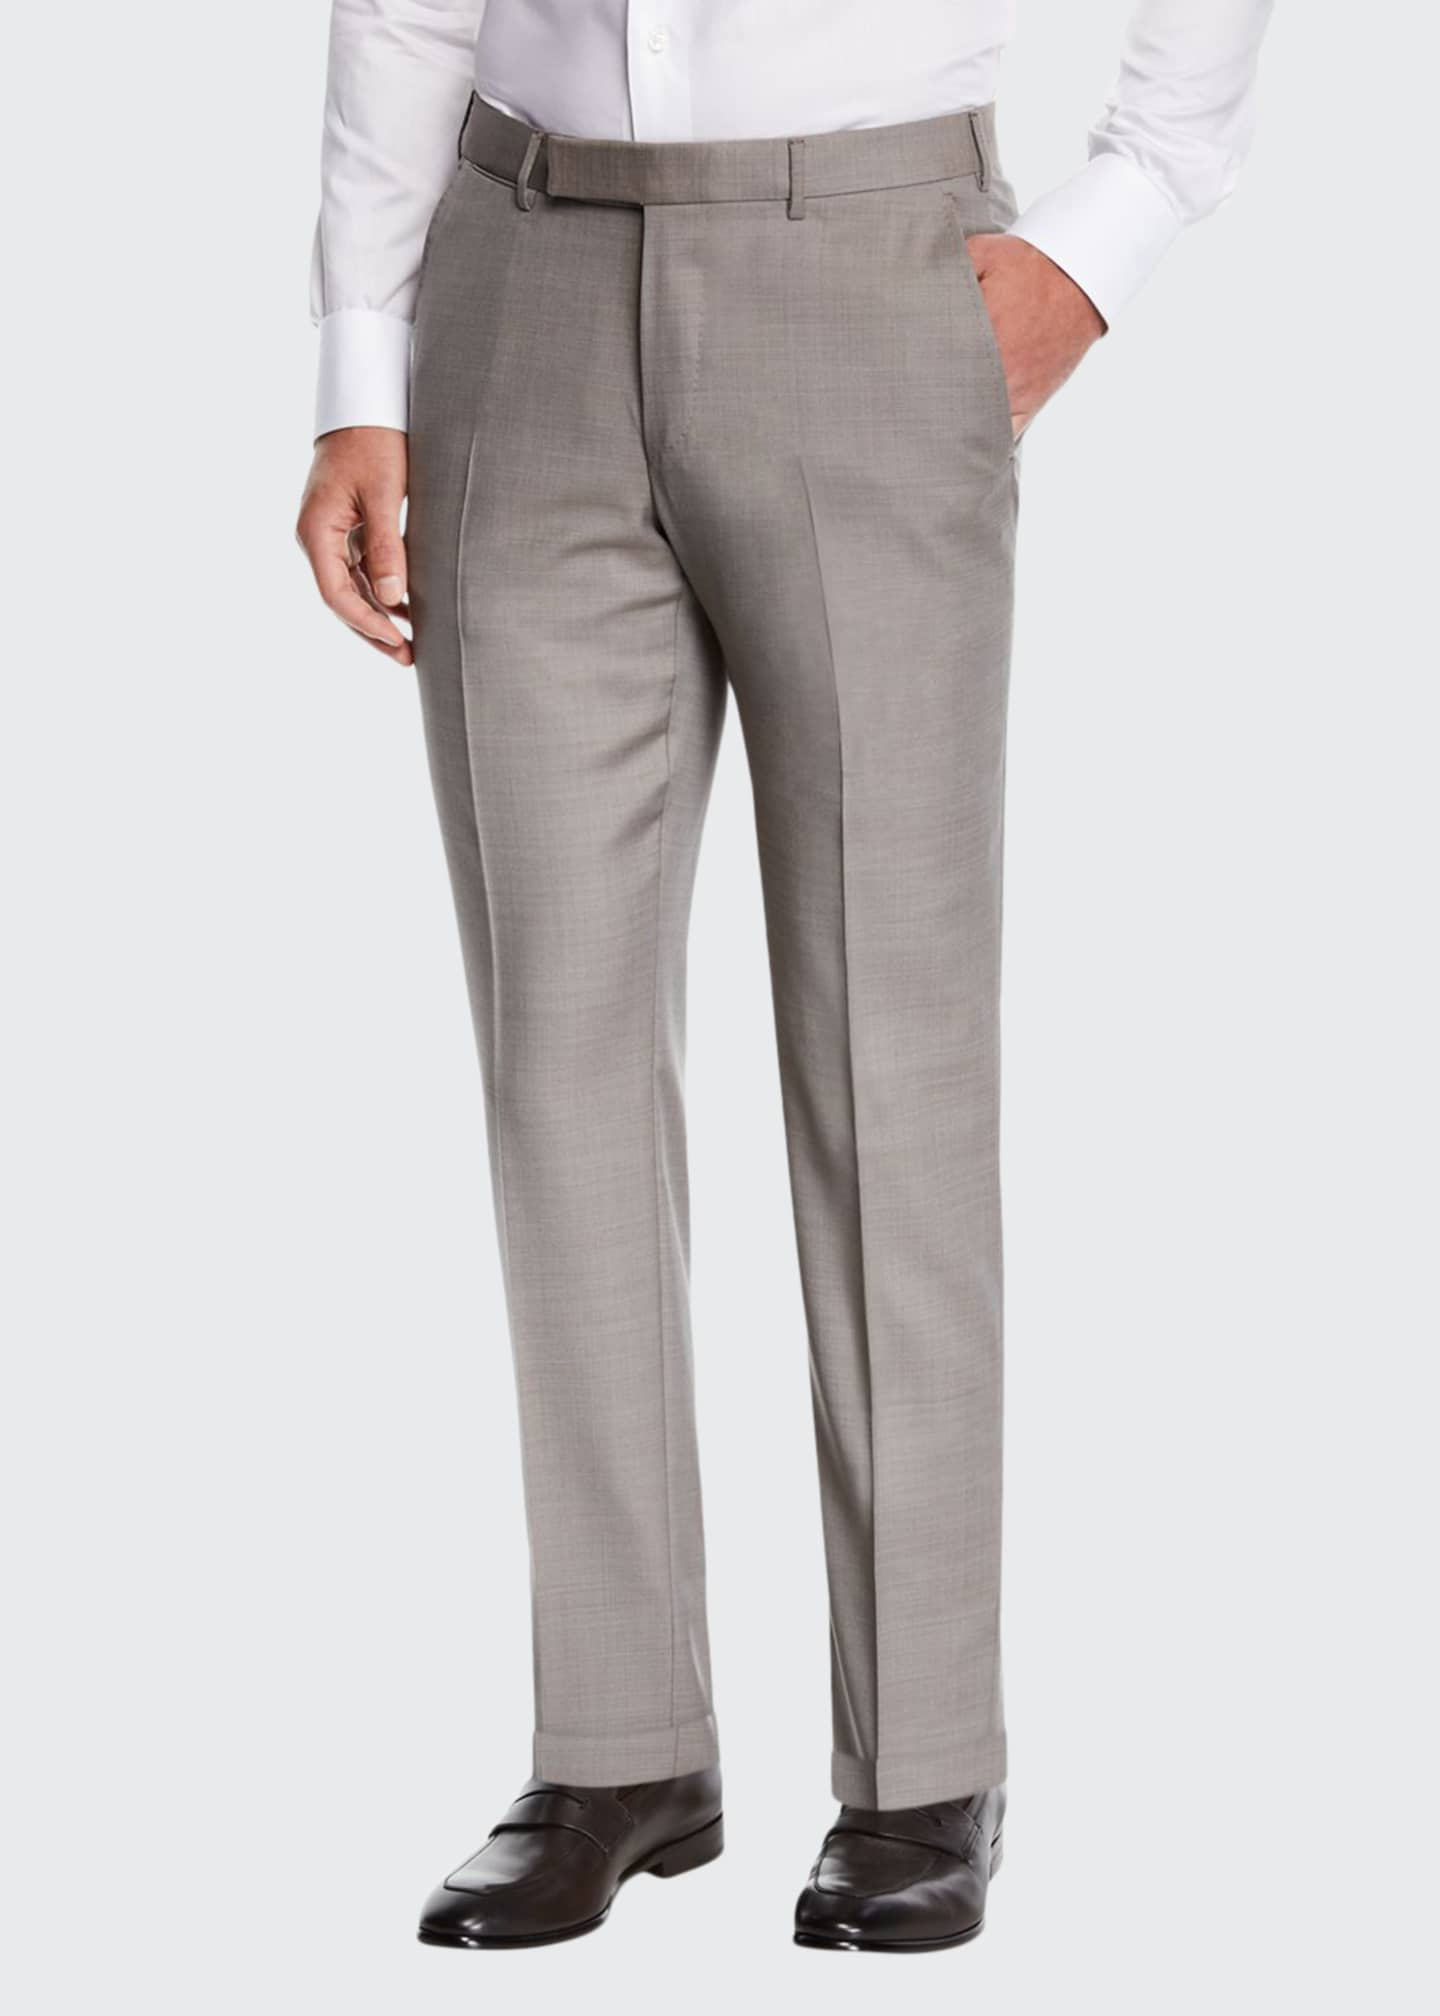 Ermenegildo Zegna Men's Achill Wool/Silk Dress Trousers